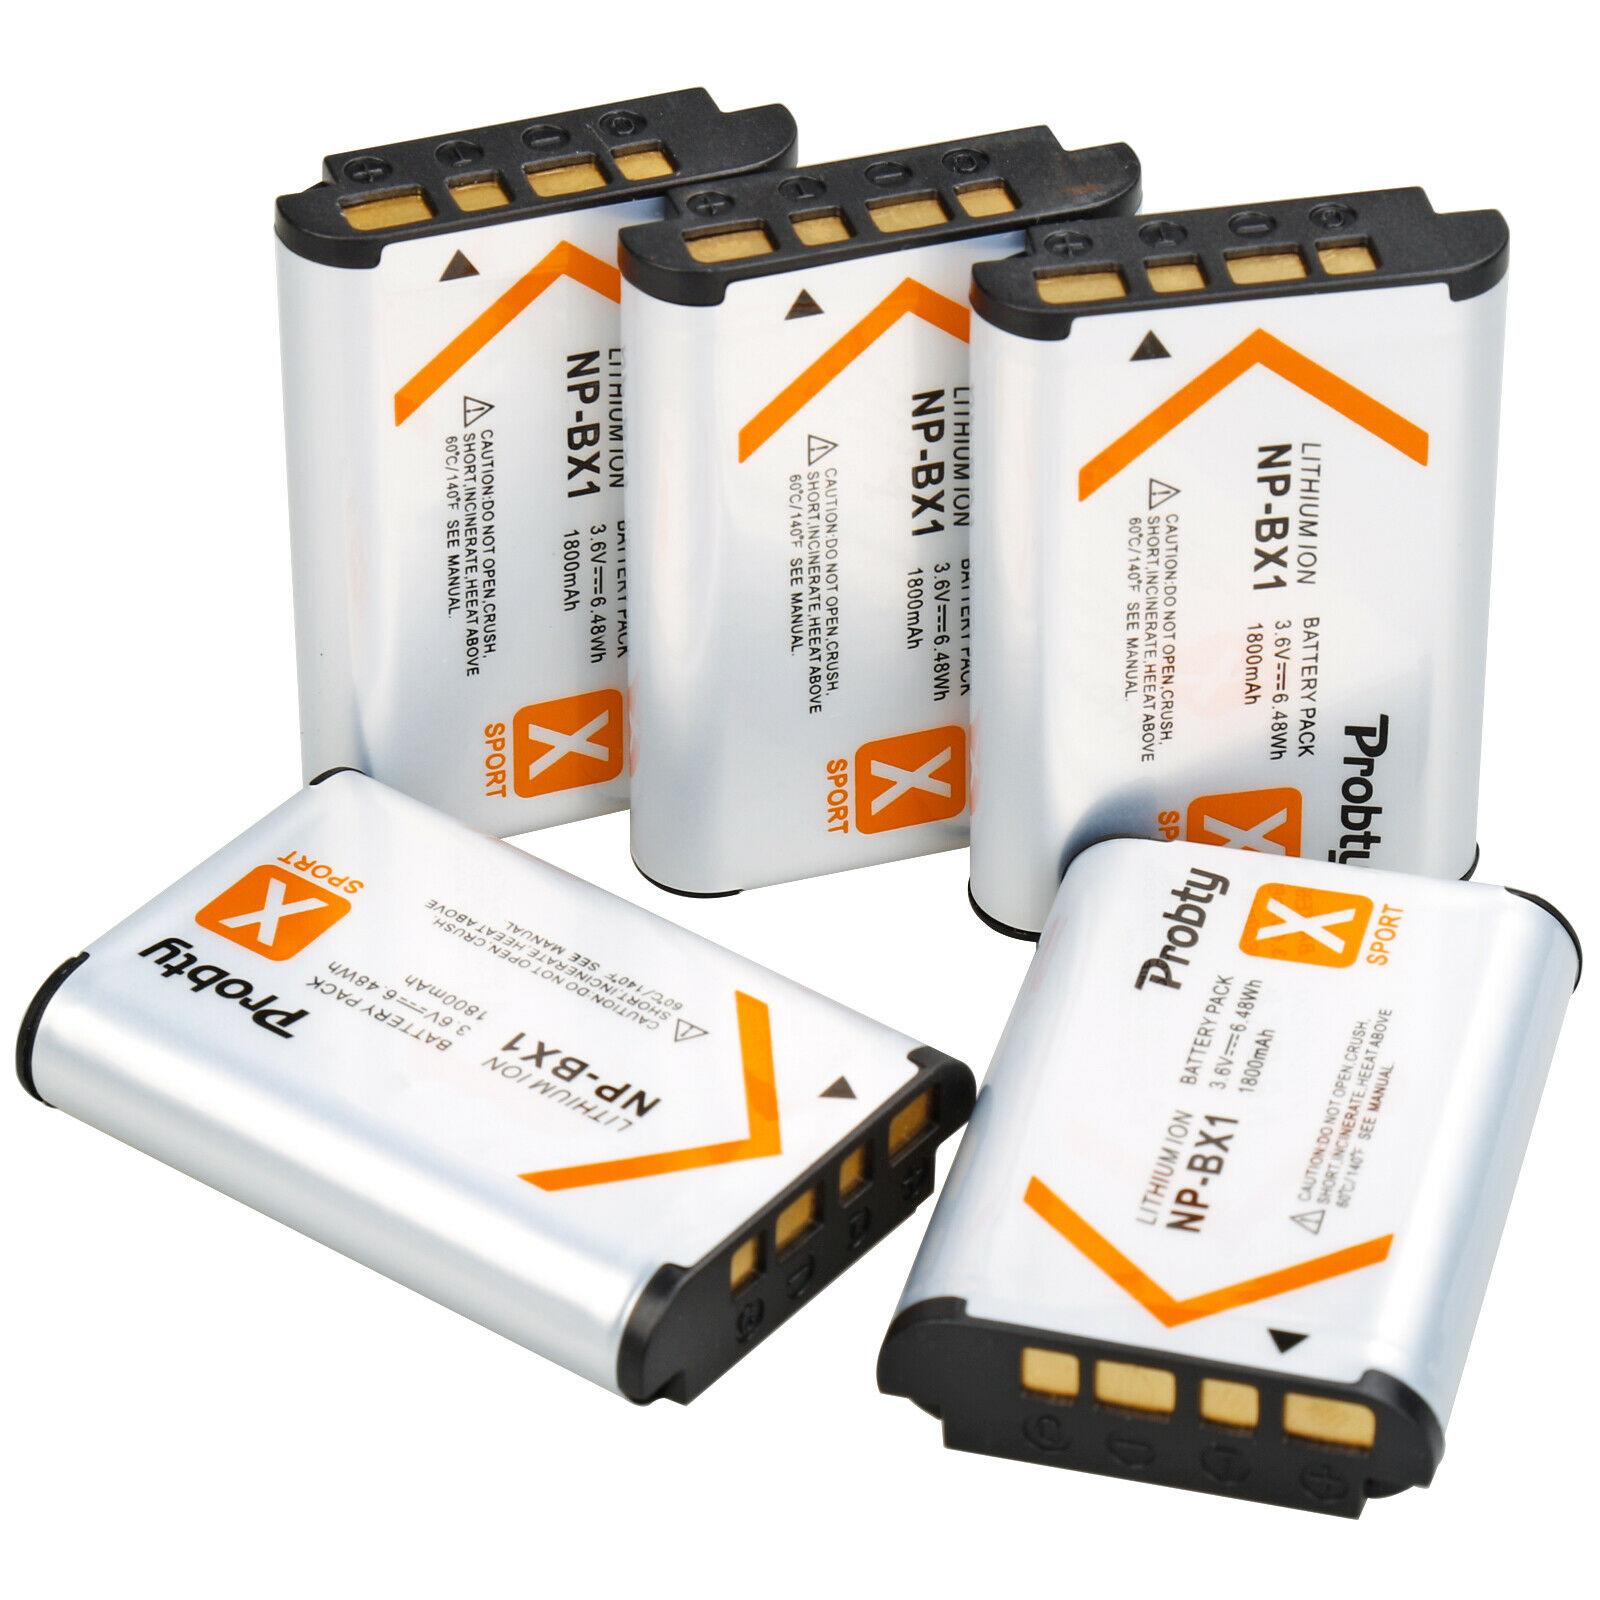 5 uds 1800mAh NP-BX1 BX1 baterías de la Cámara batería AKKU paquete para Sony DSC-RX100 IV RX10 II RX1 HX300 WX300 WX500 HDR-AS15 CX240E